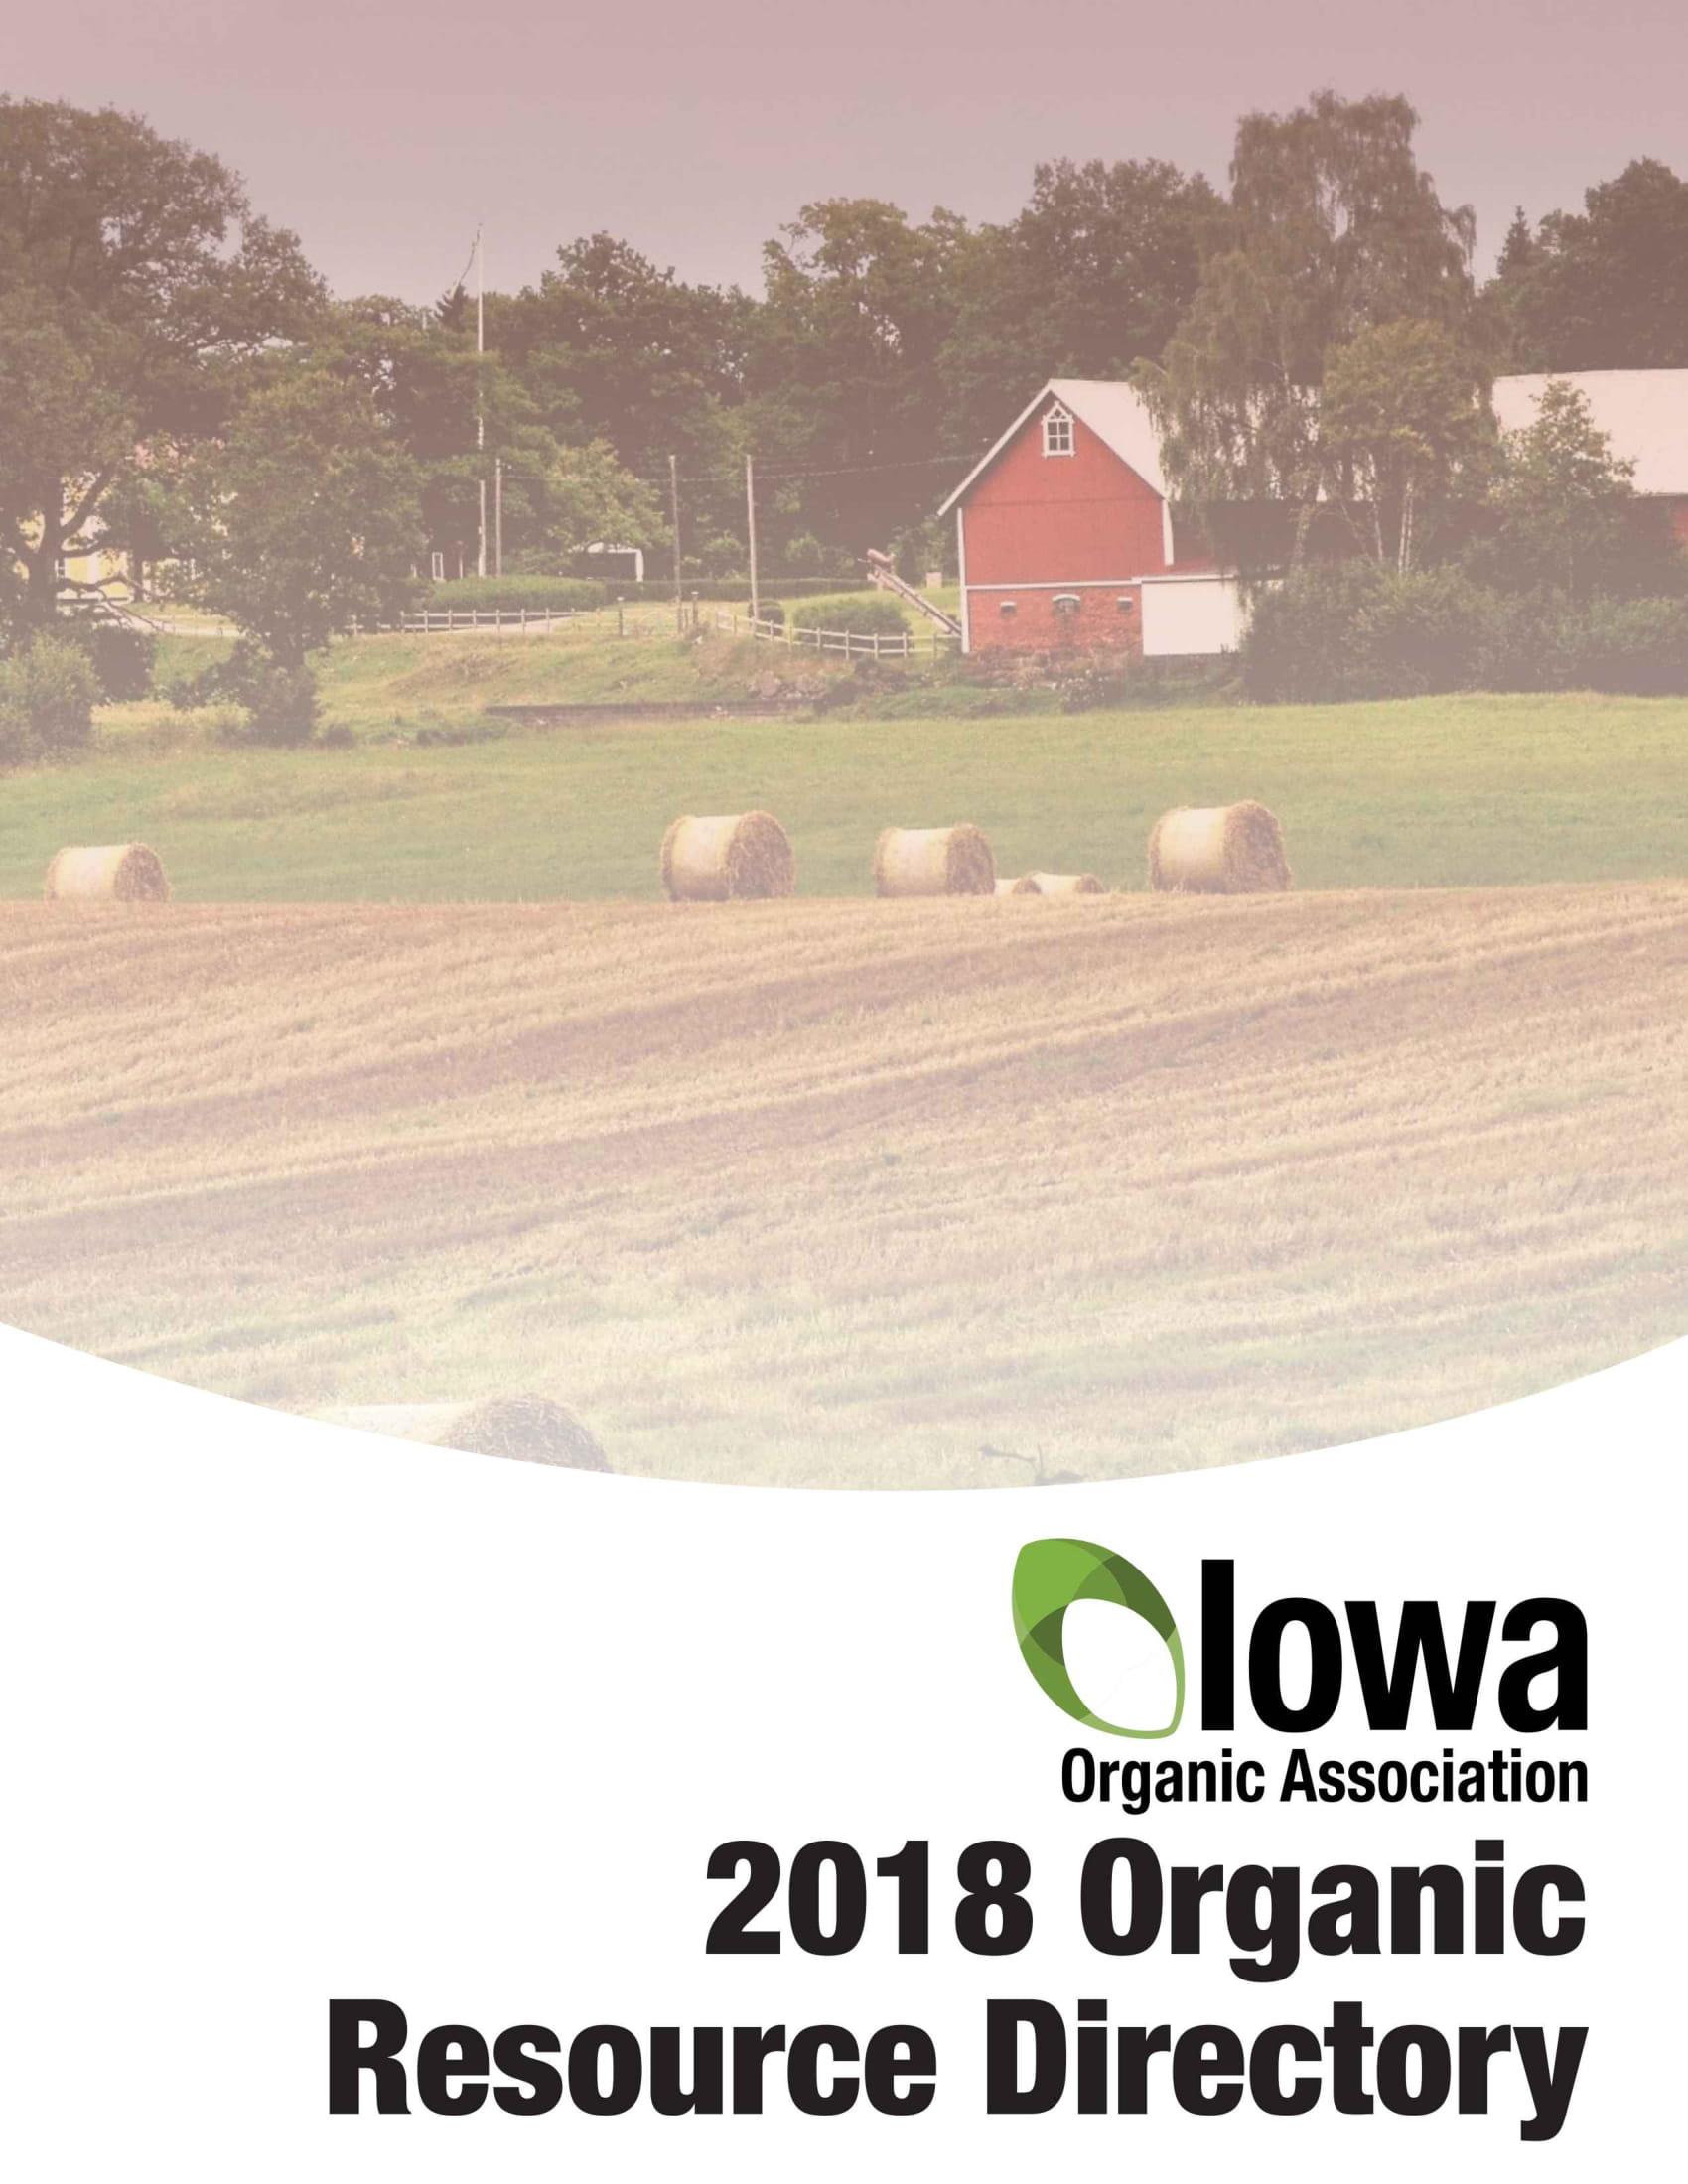 Organic Farmer Resources & Services - Iowa Organic Association